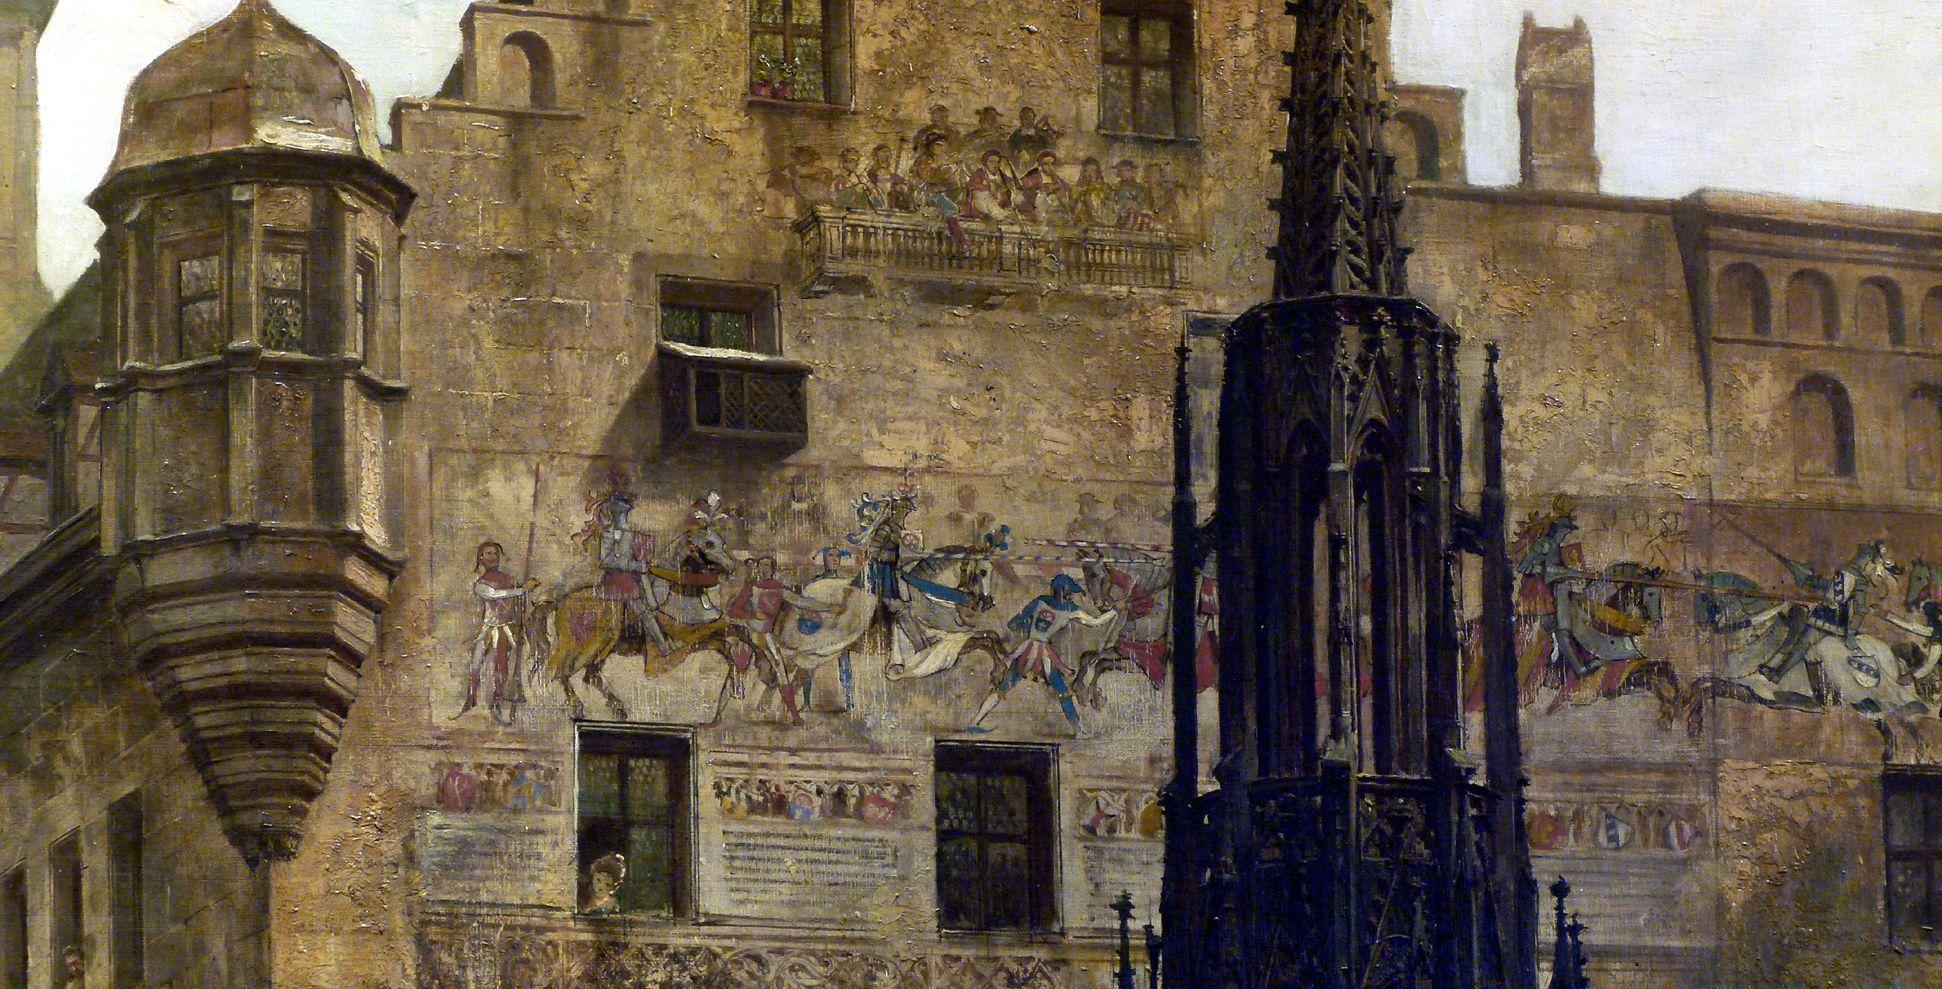 Main Market with view into Burgstraße Façade fresco paintings